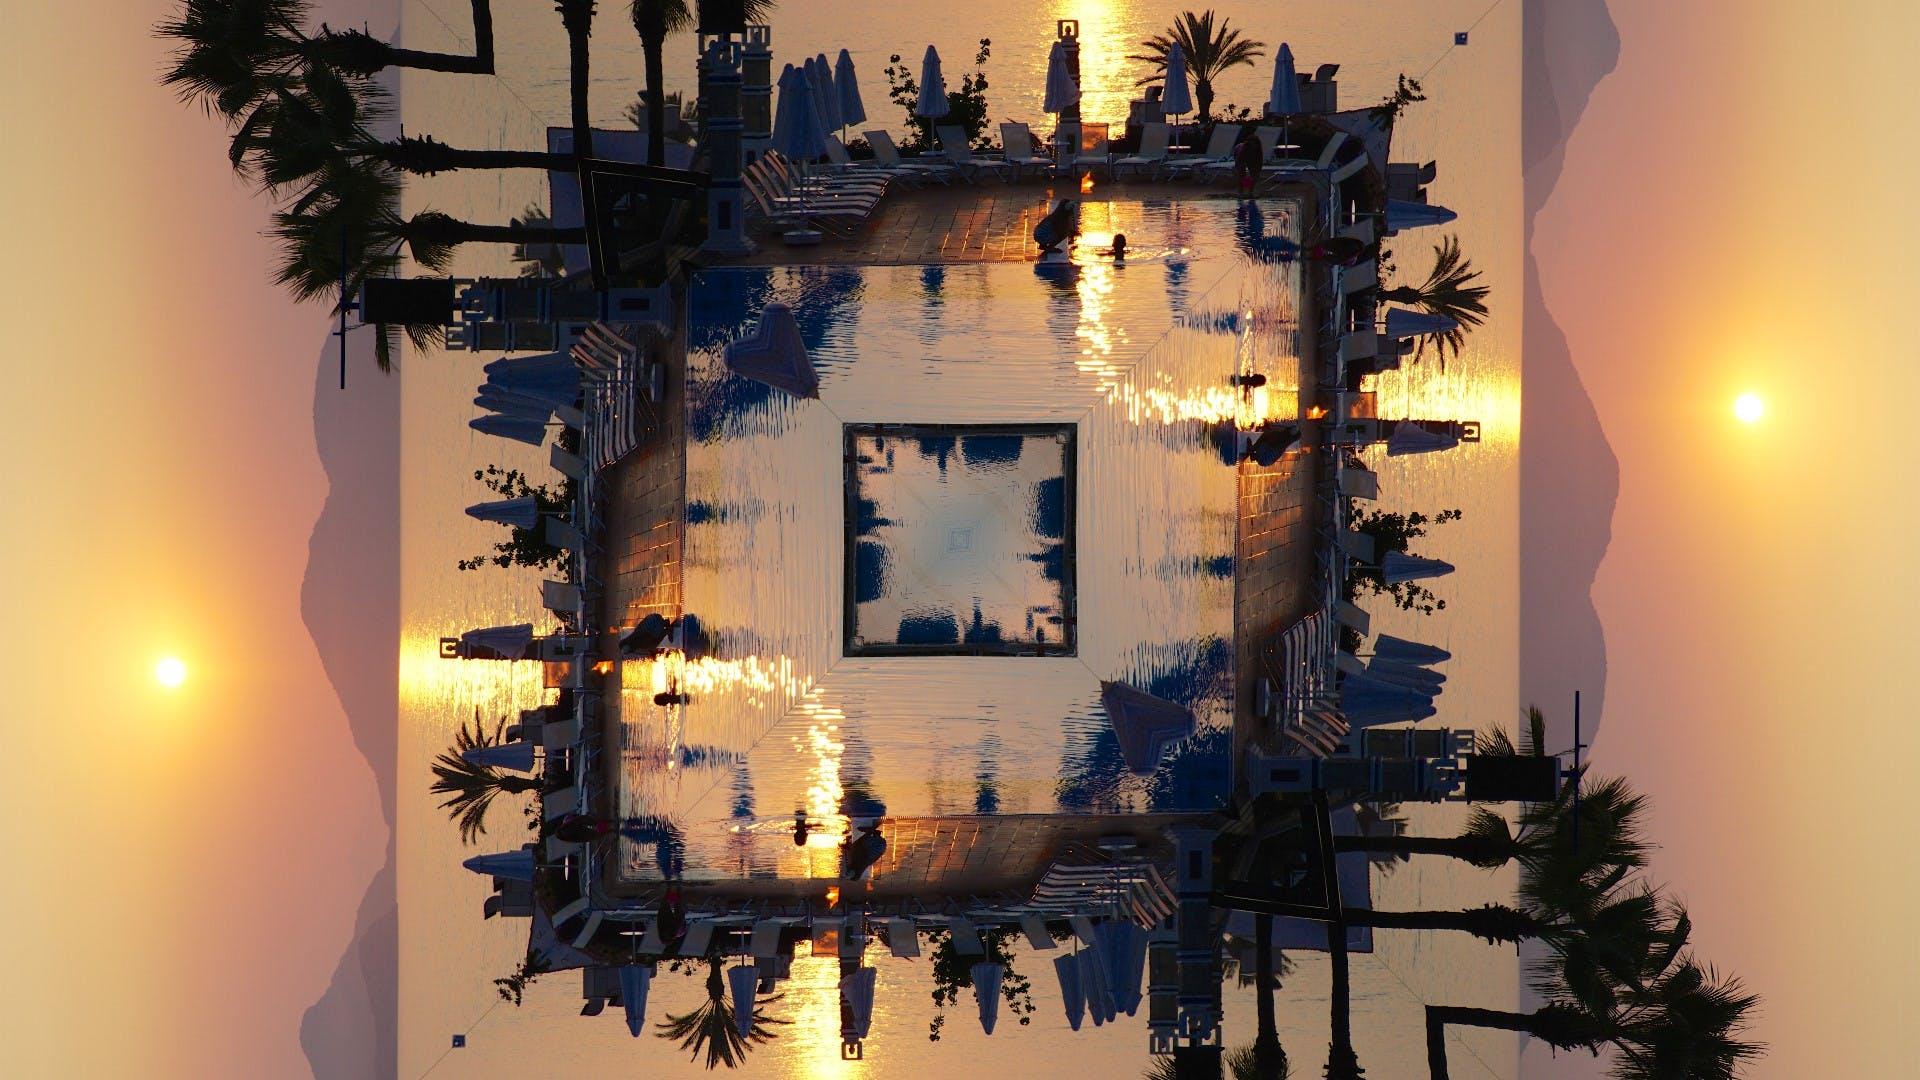 Free stock photo of #kaleidoscope art #unique design #sunset